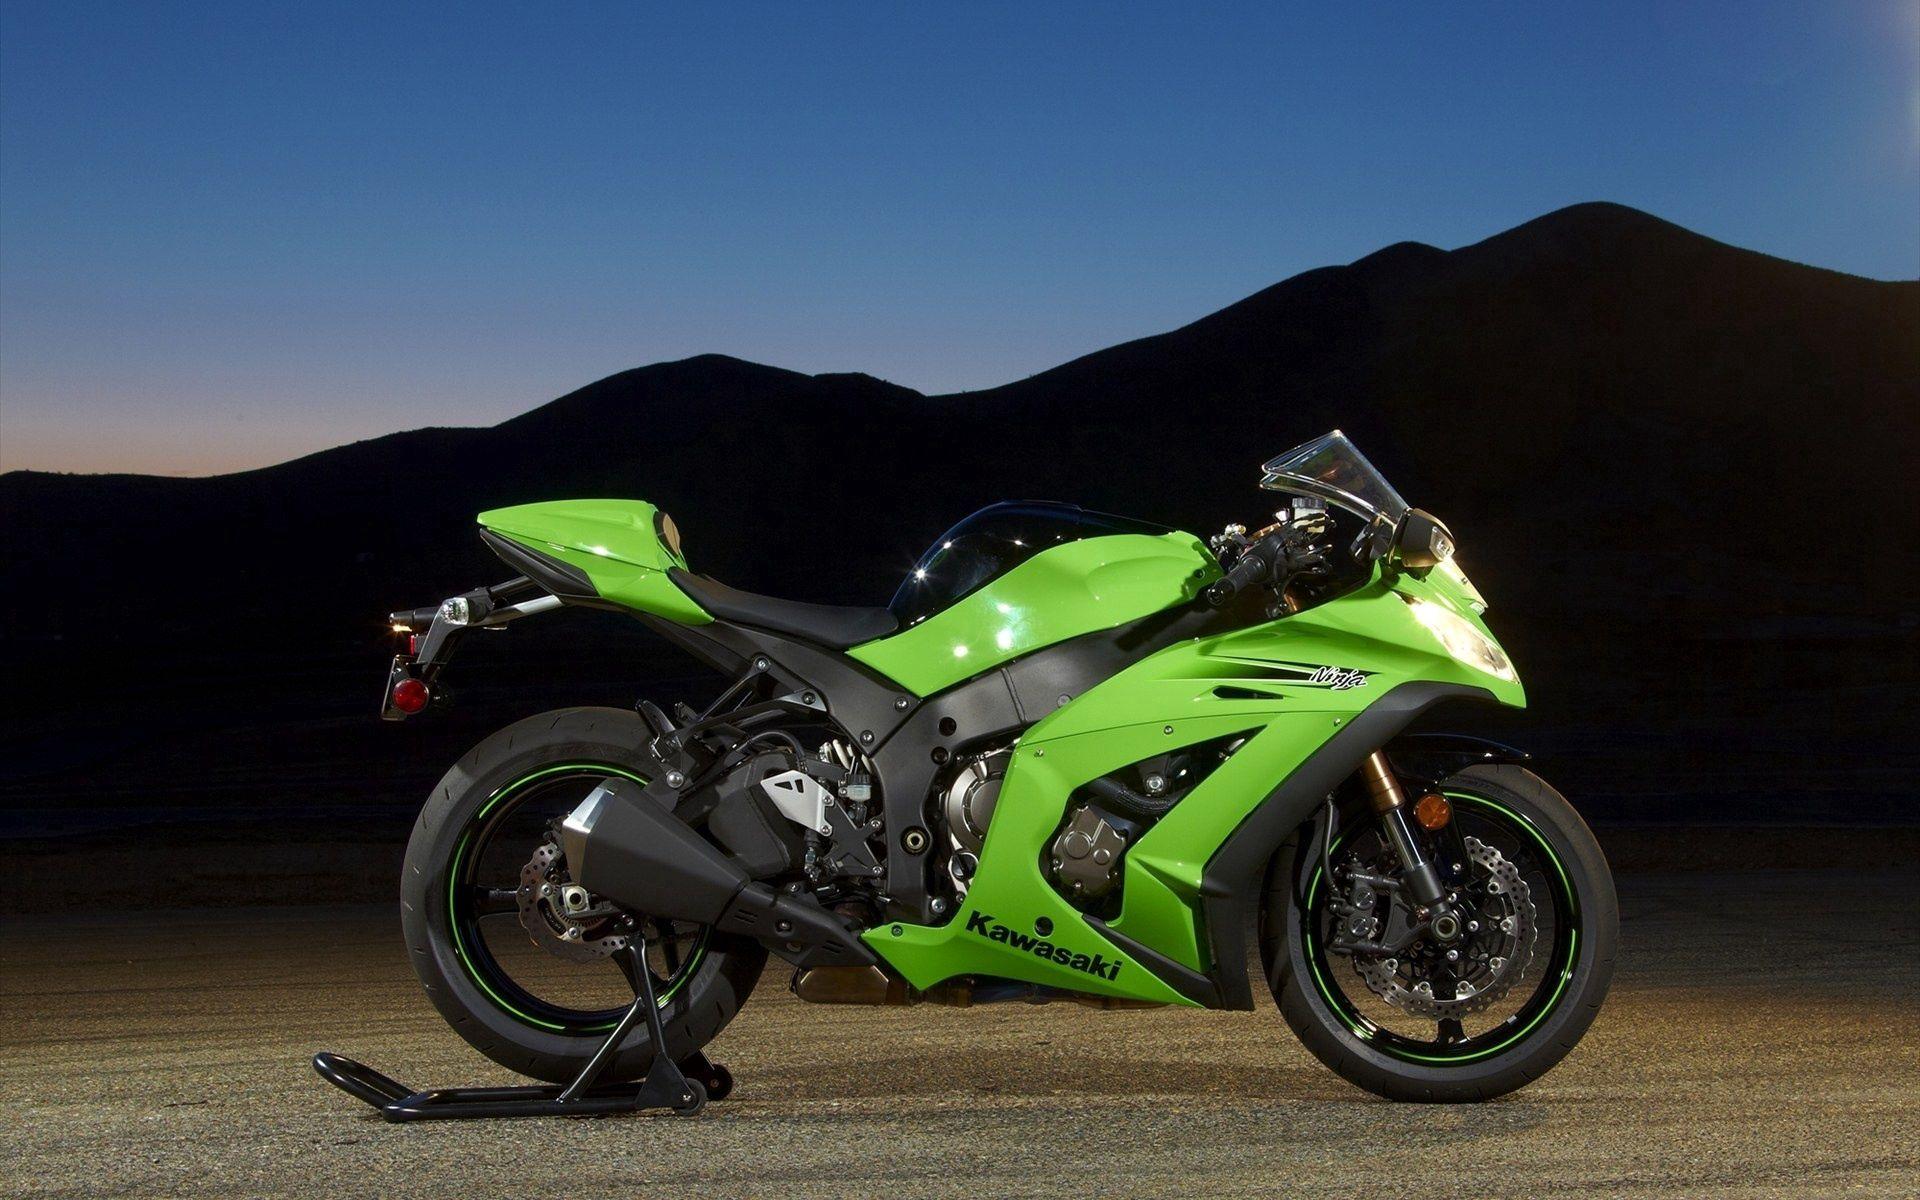 136531 скачать обои Мотоциклы, Kawasaki Ninja, Мотоцикл, Спорт - заставки и картинки бесплатно